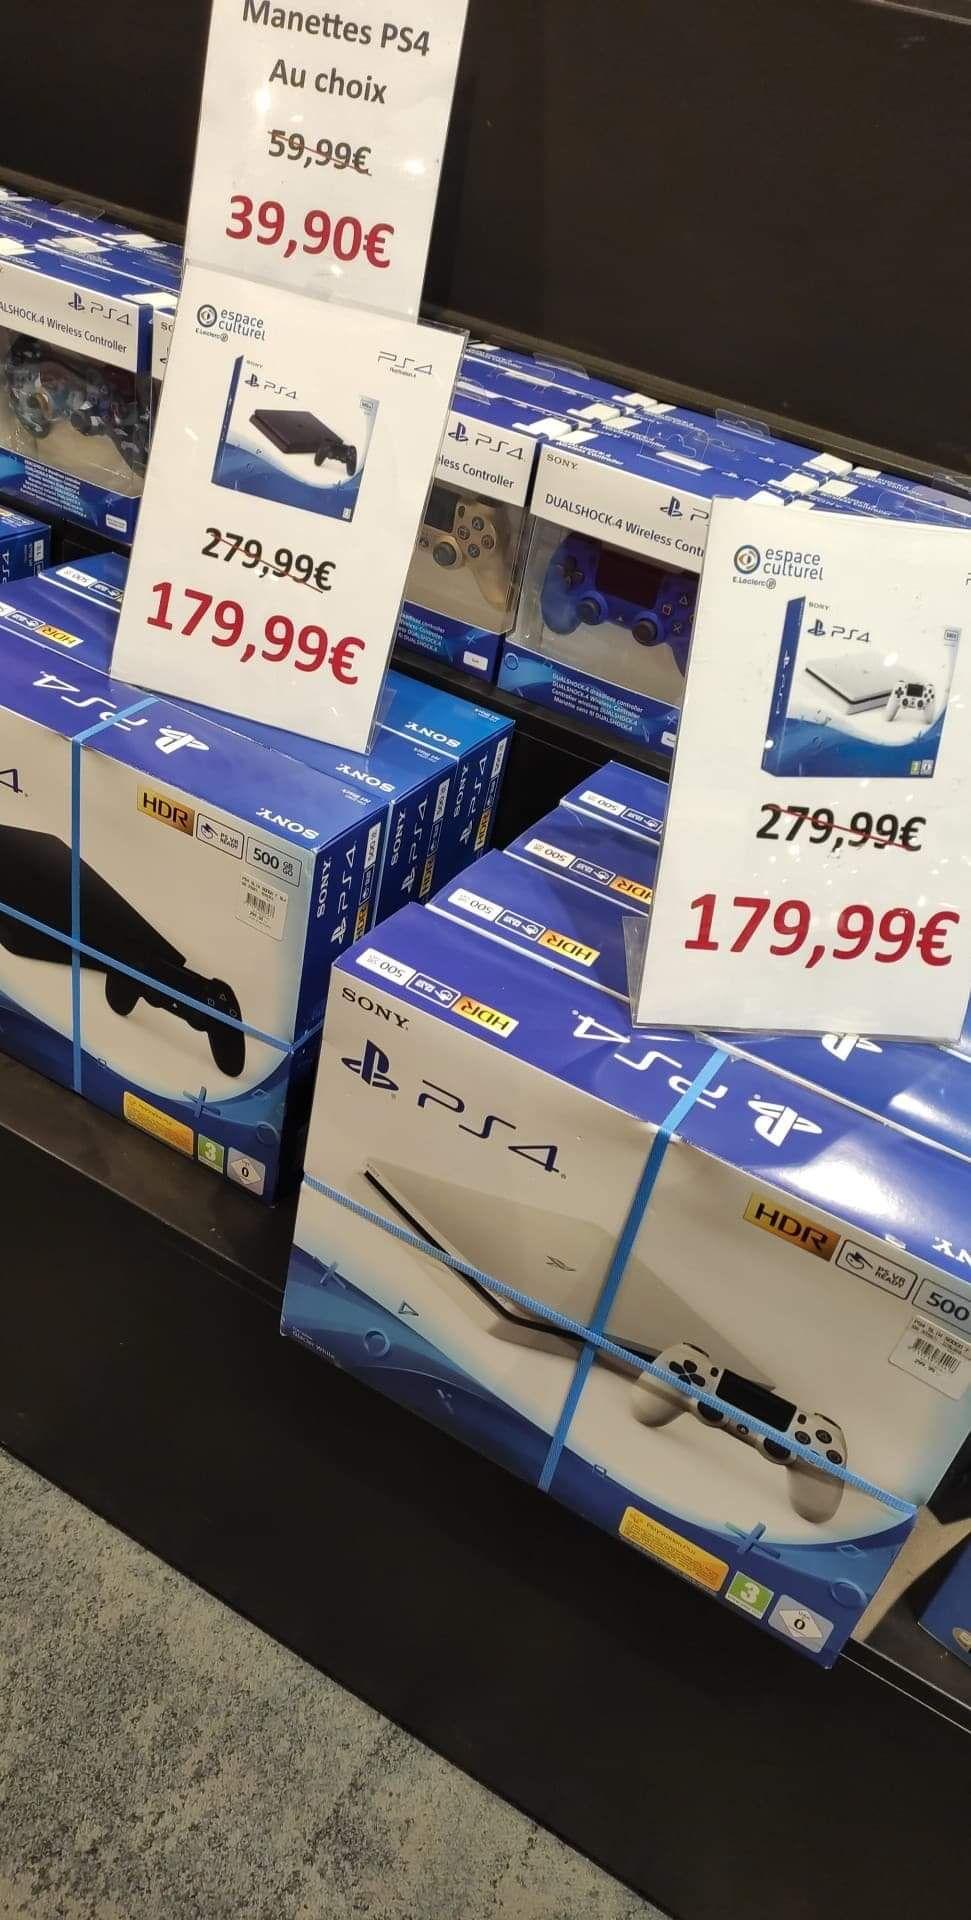 Console Sony PS4 Slim 500 Go (Noire ou Blanche) - Marseille (13009)